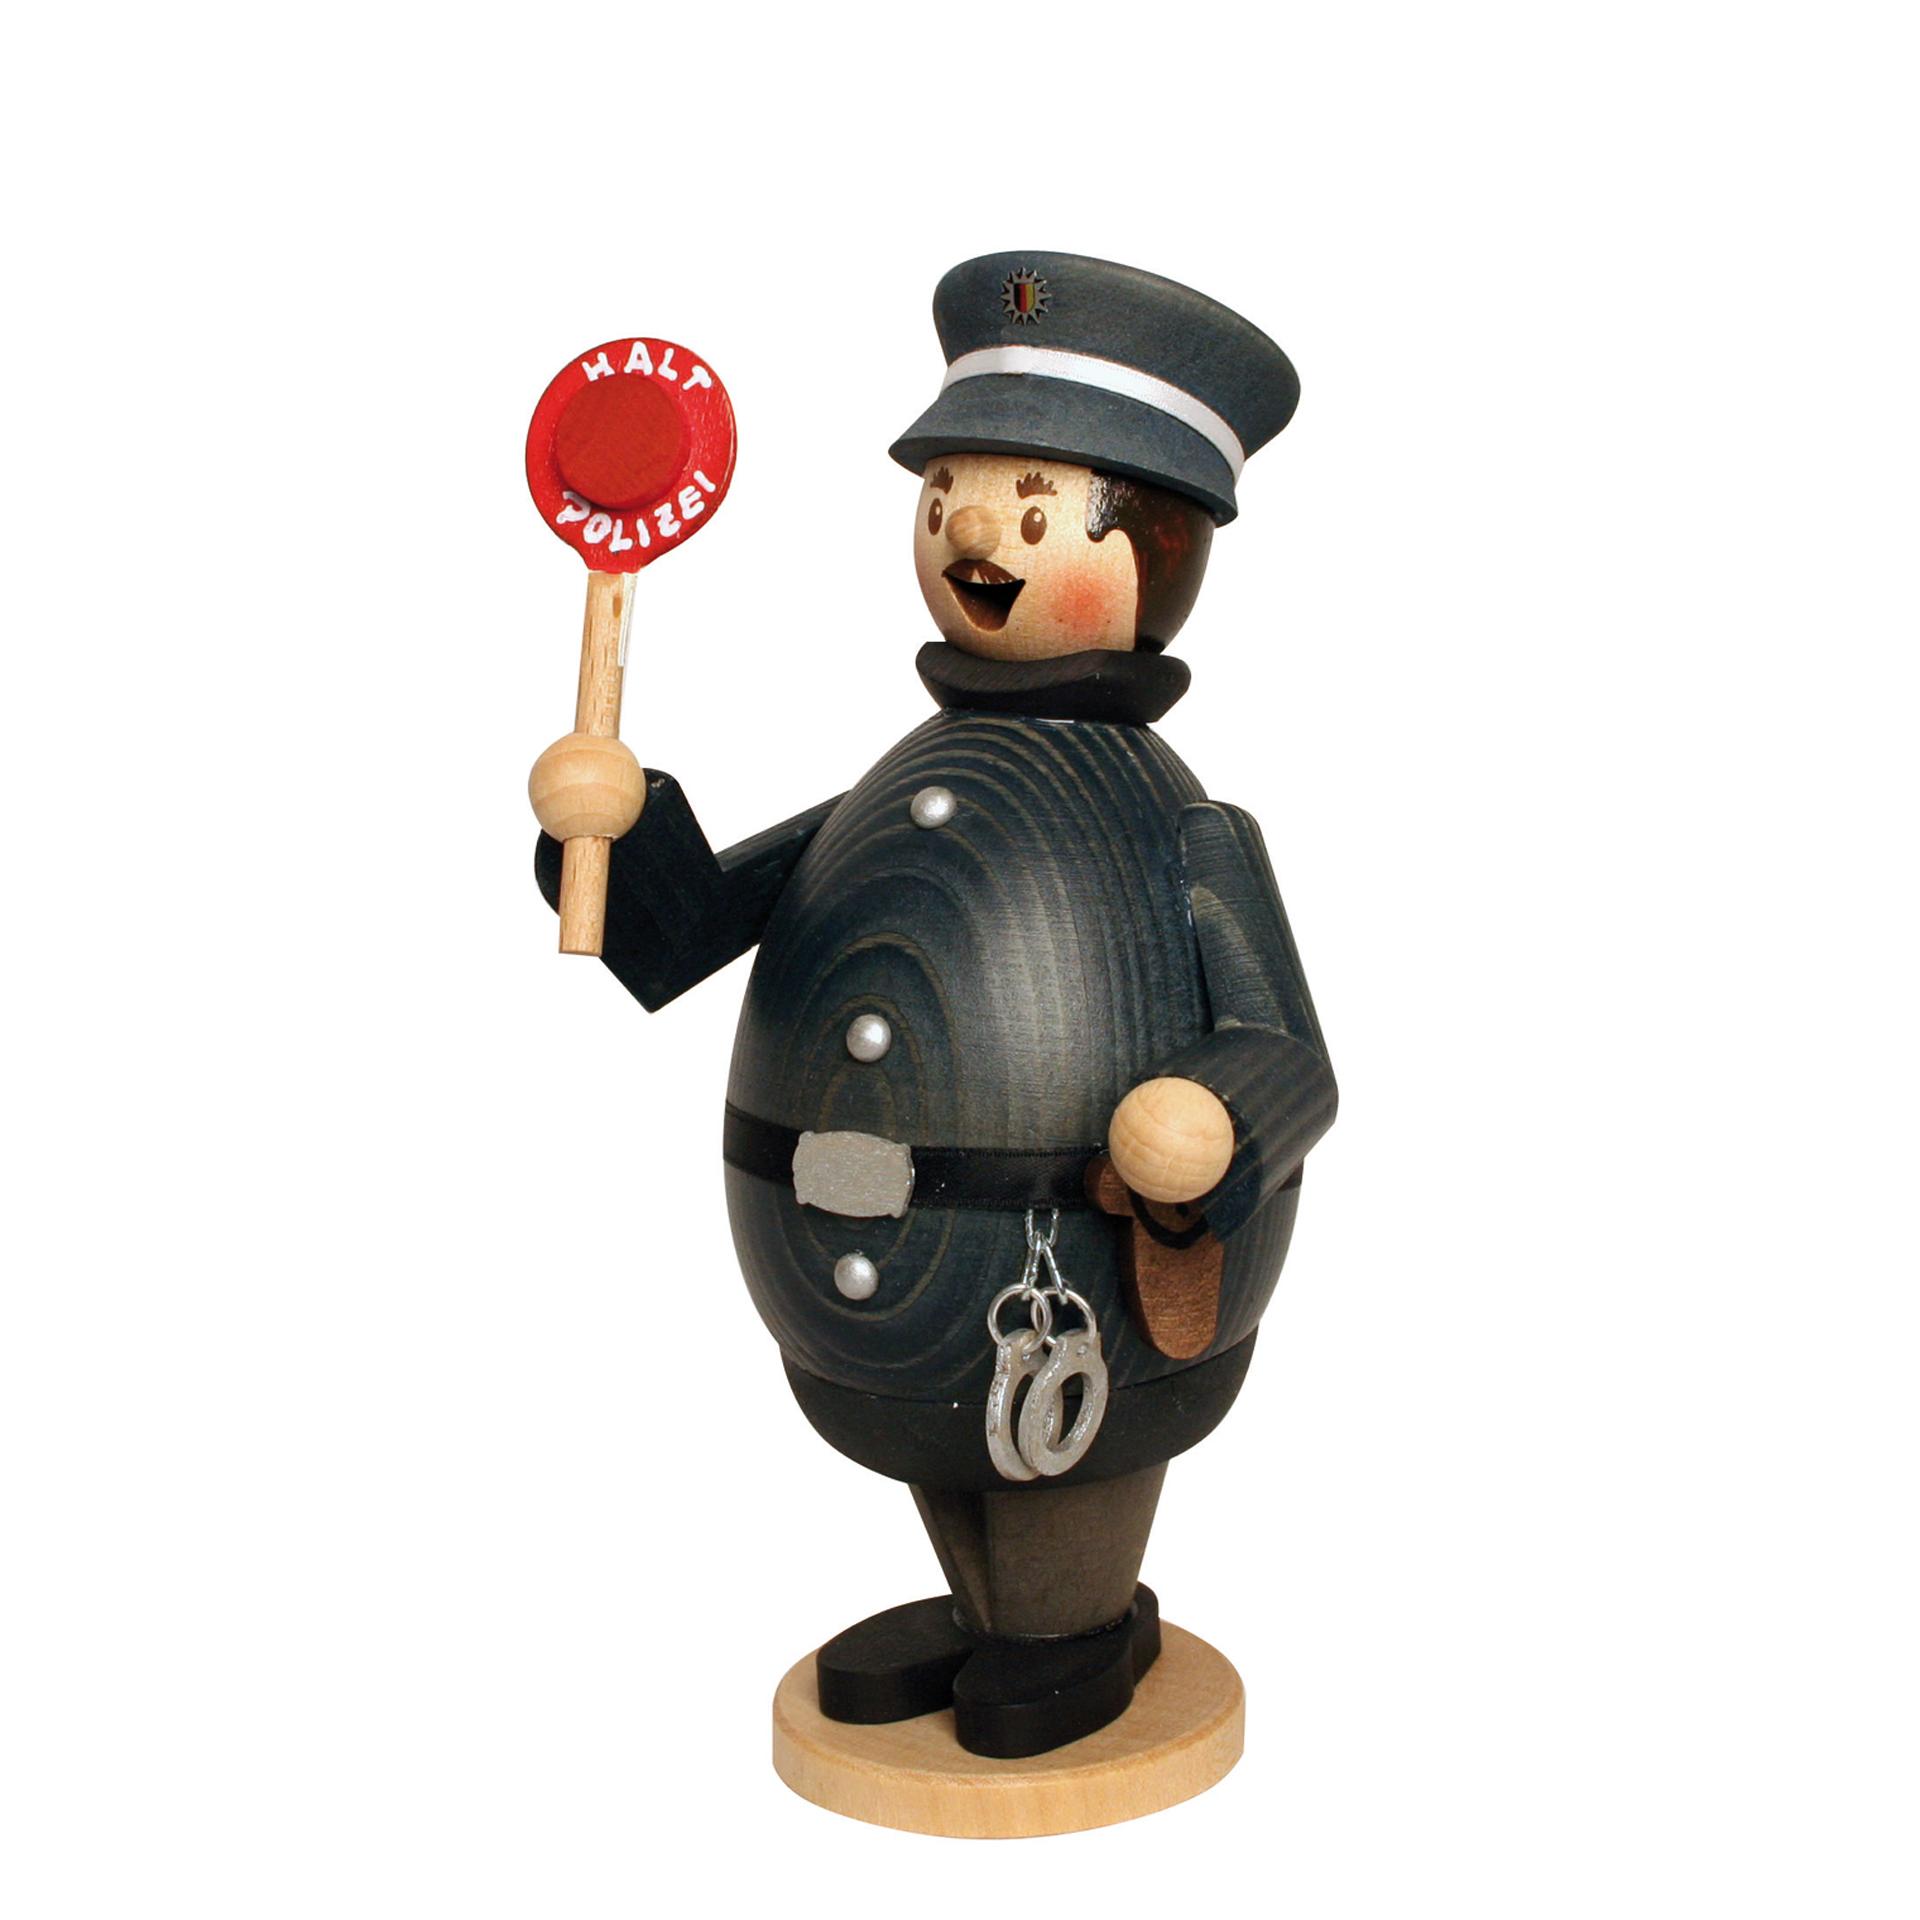 Max Polizist